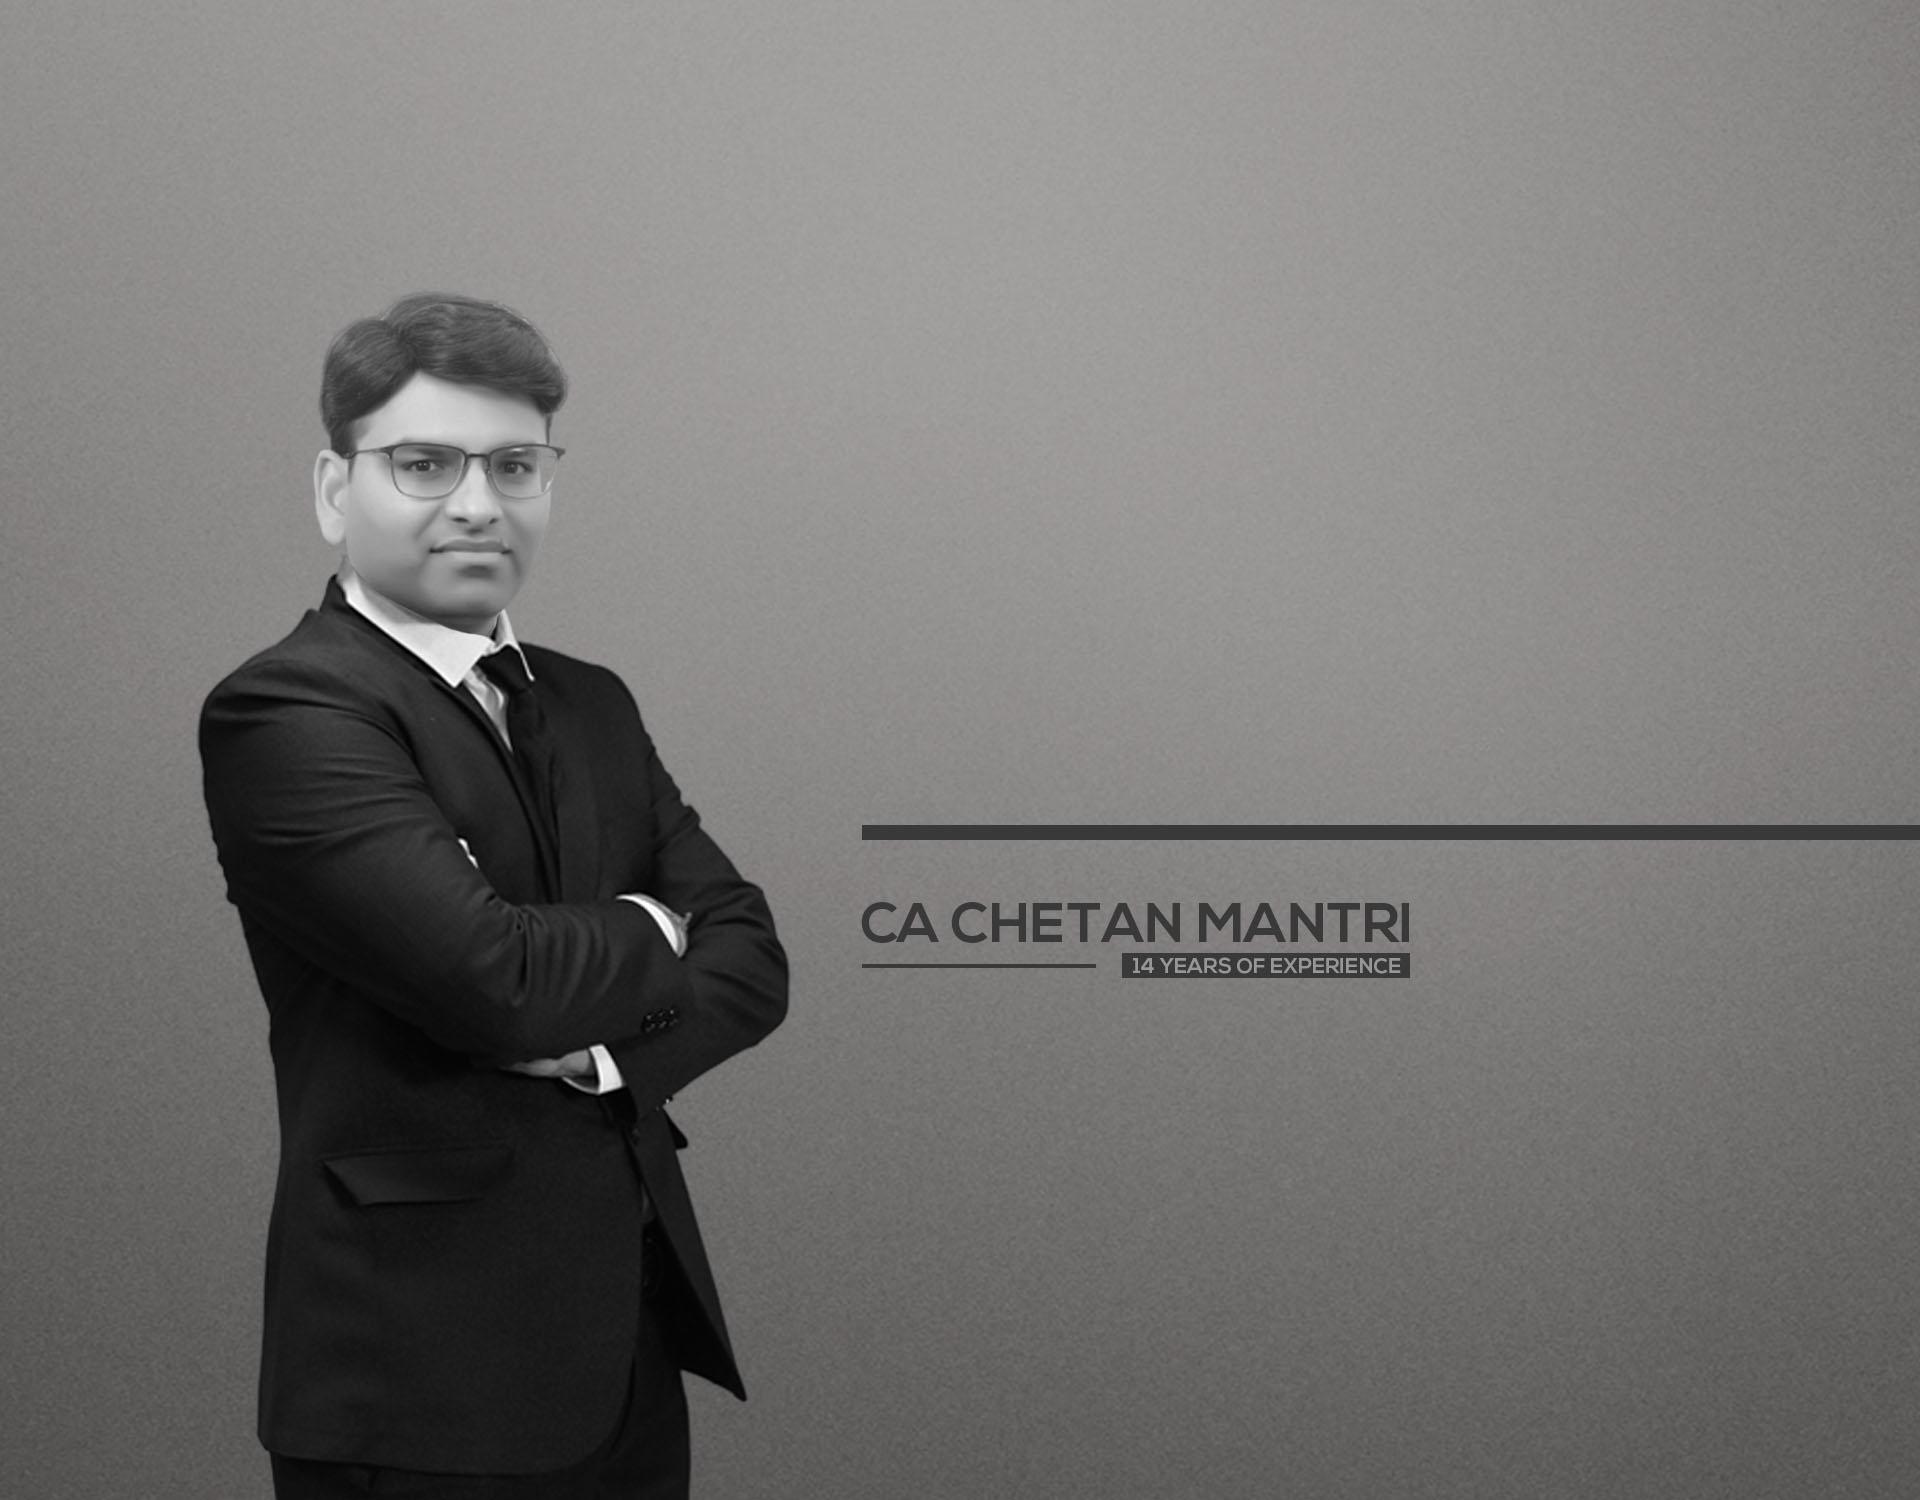 Mantri Sir 1500